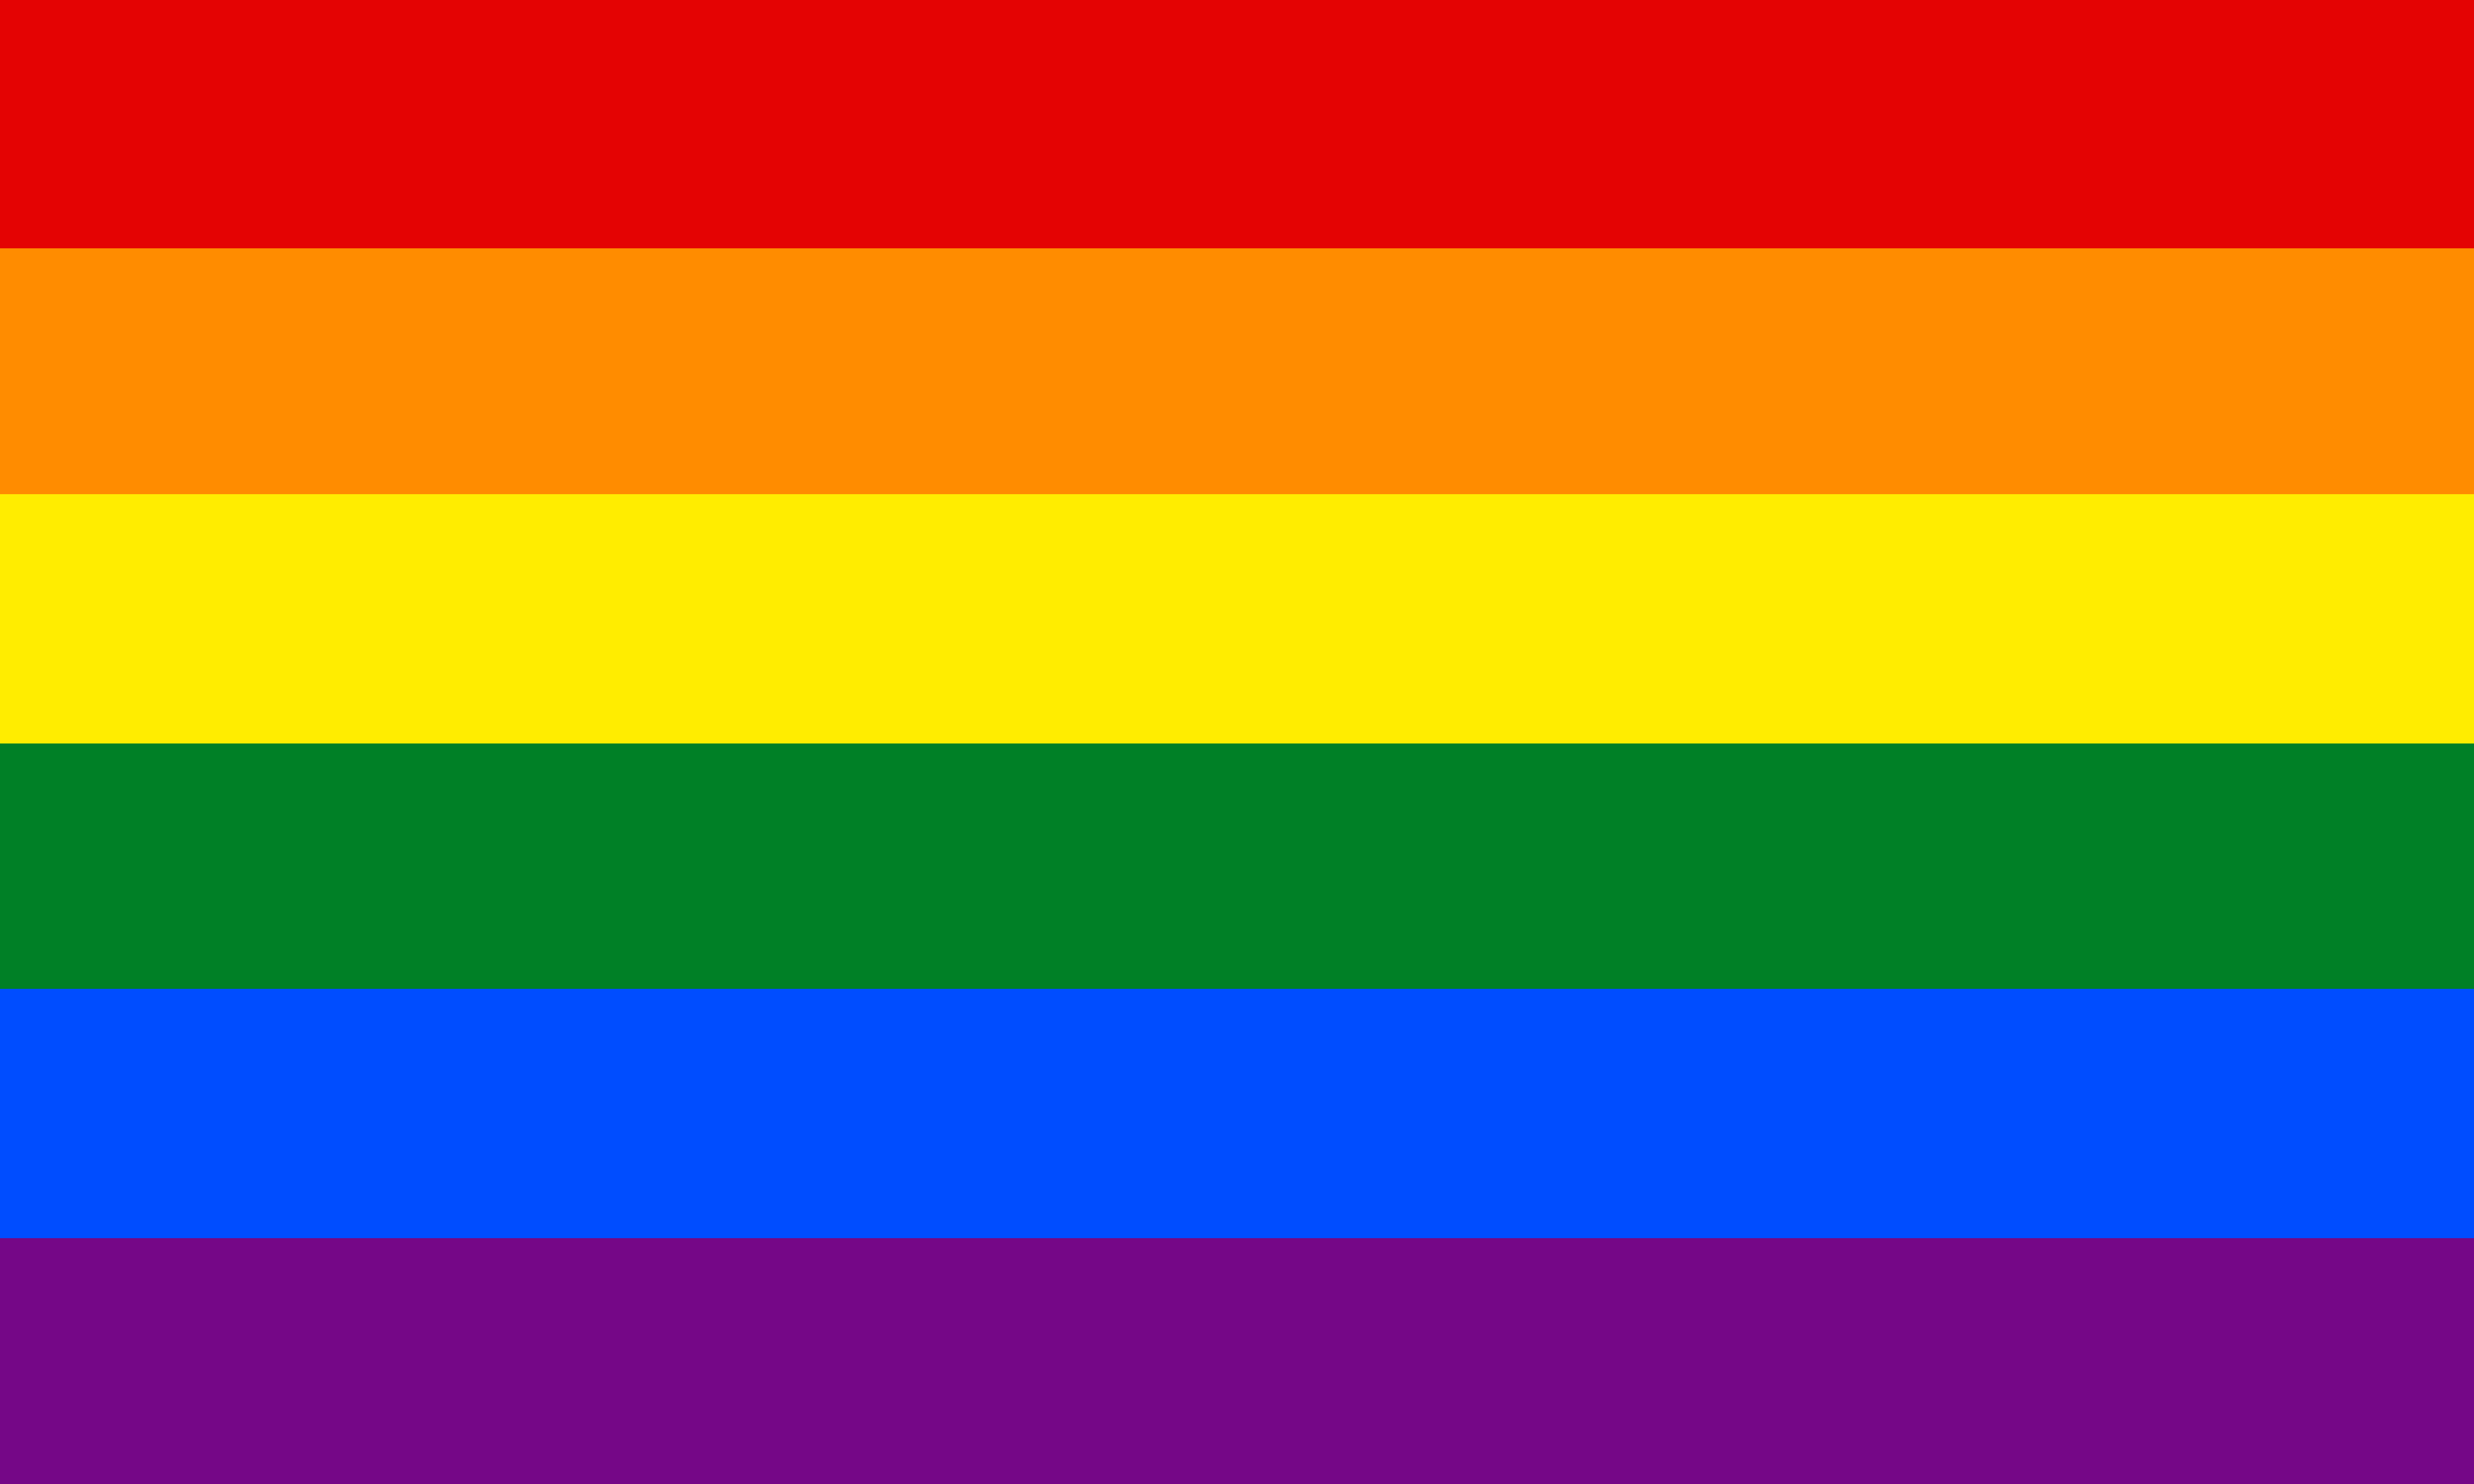 bandera lesbiana